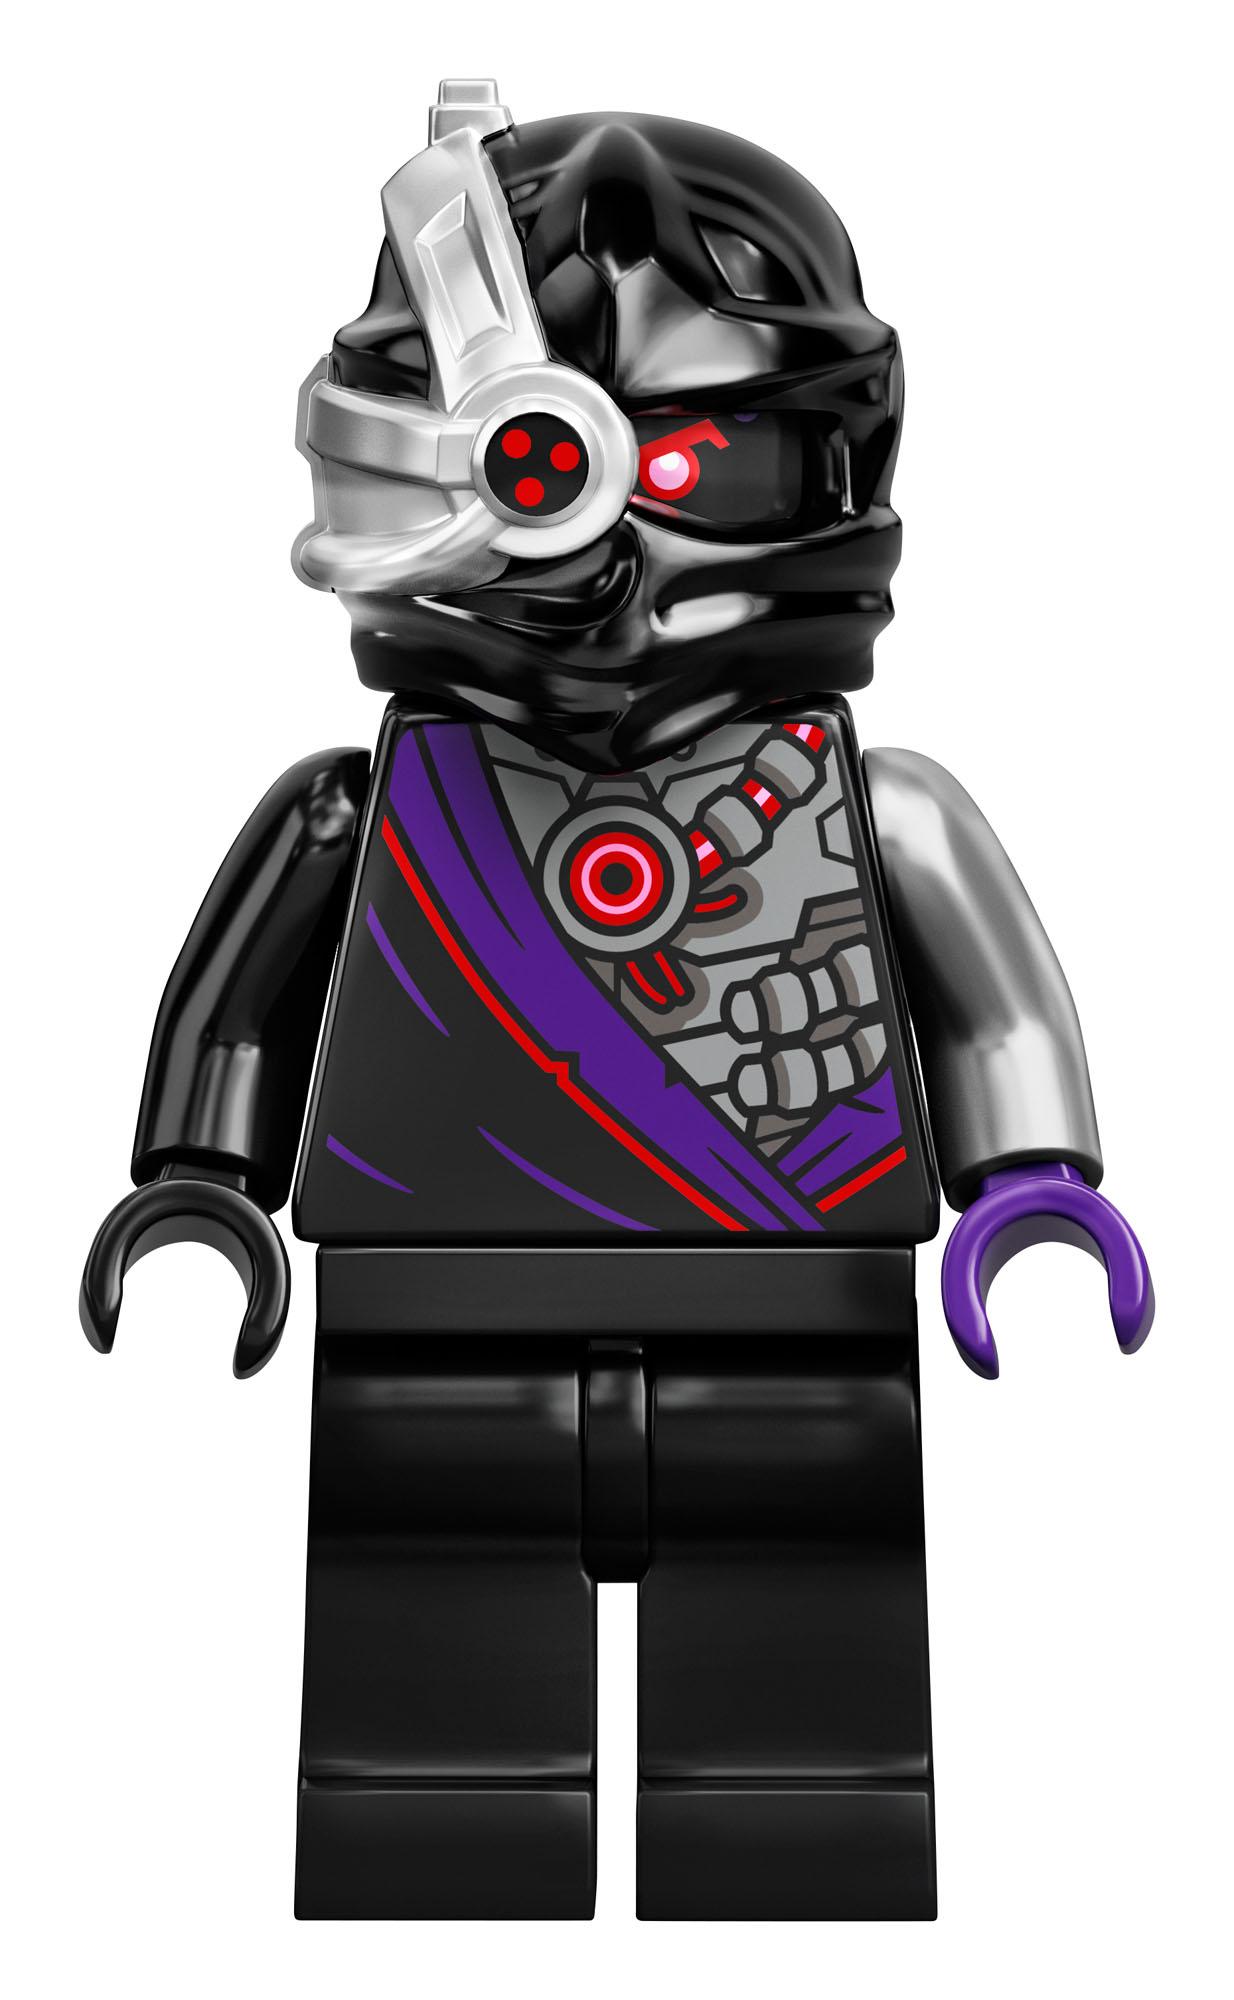 71704 LEGO Ninjago Kai Fighter Playset with 3 Minifigures ...